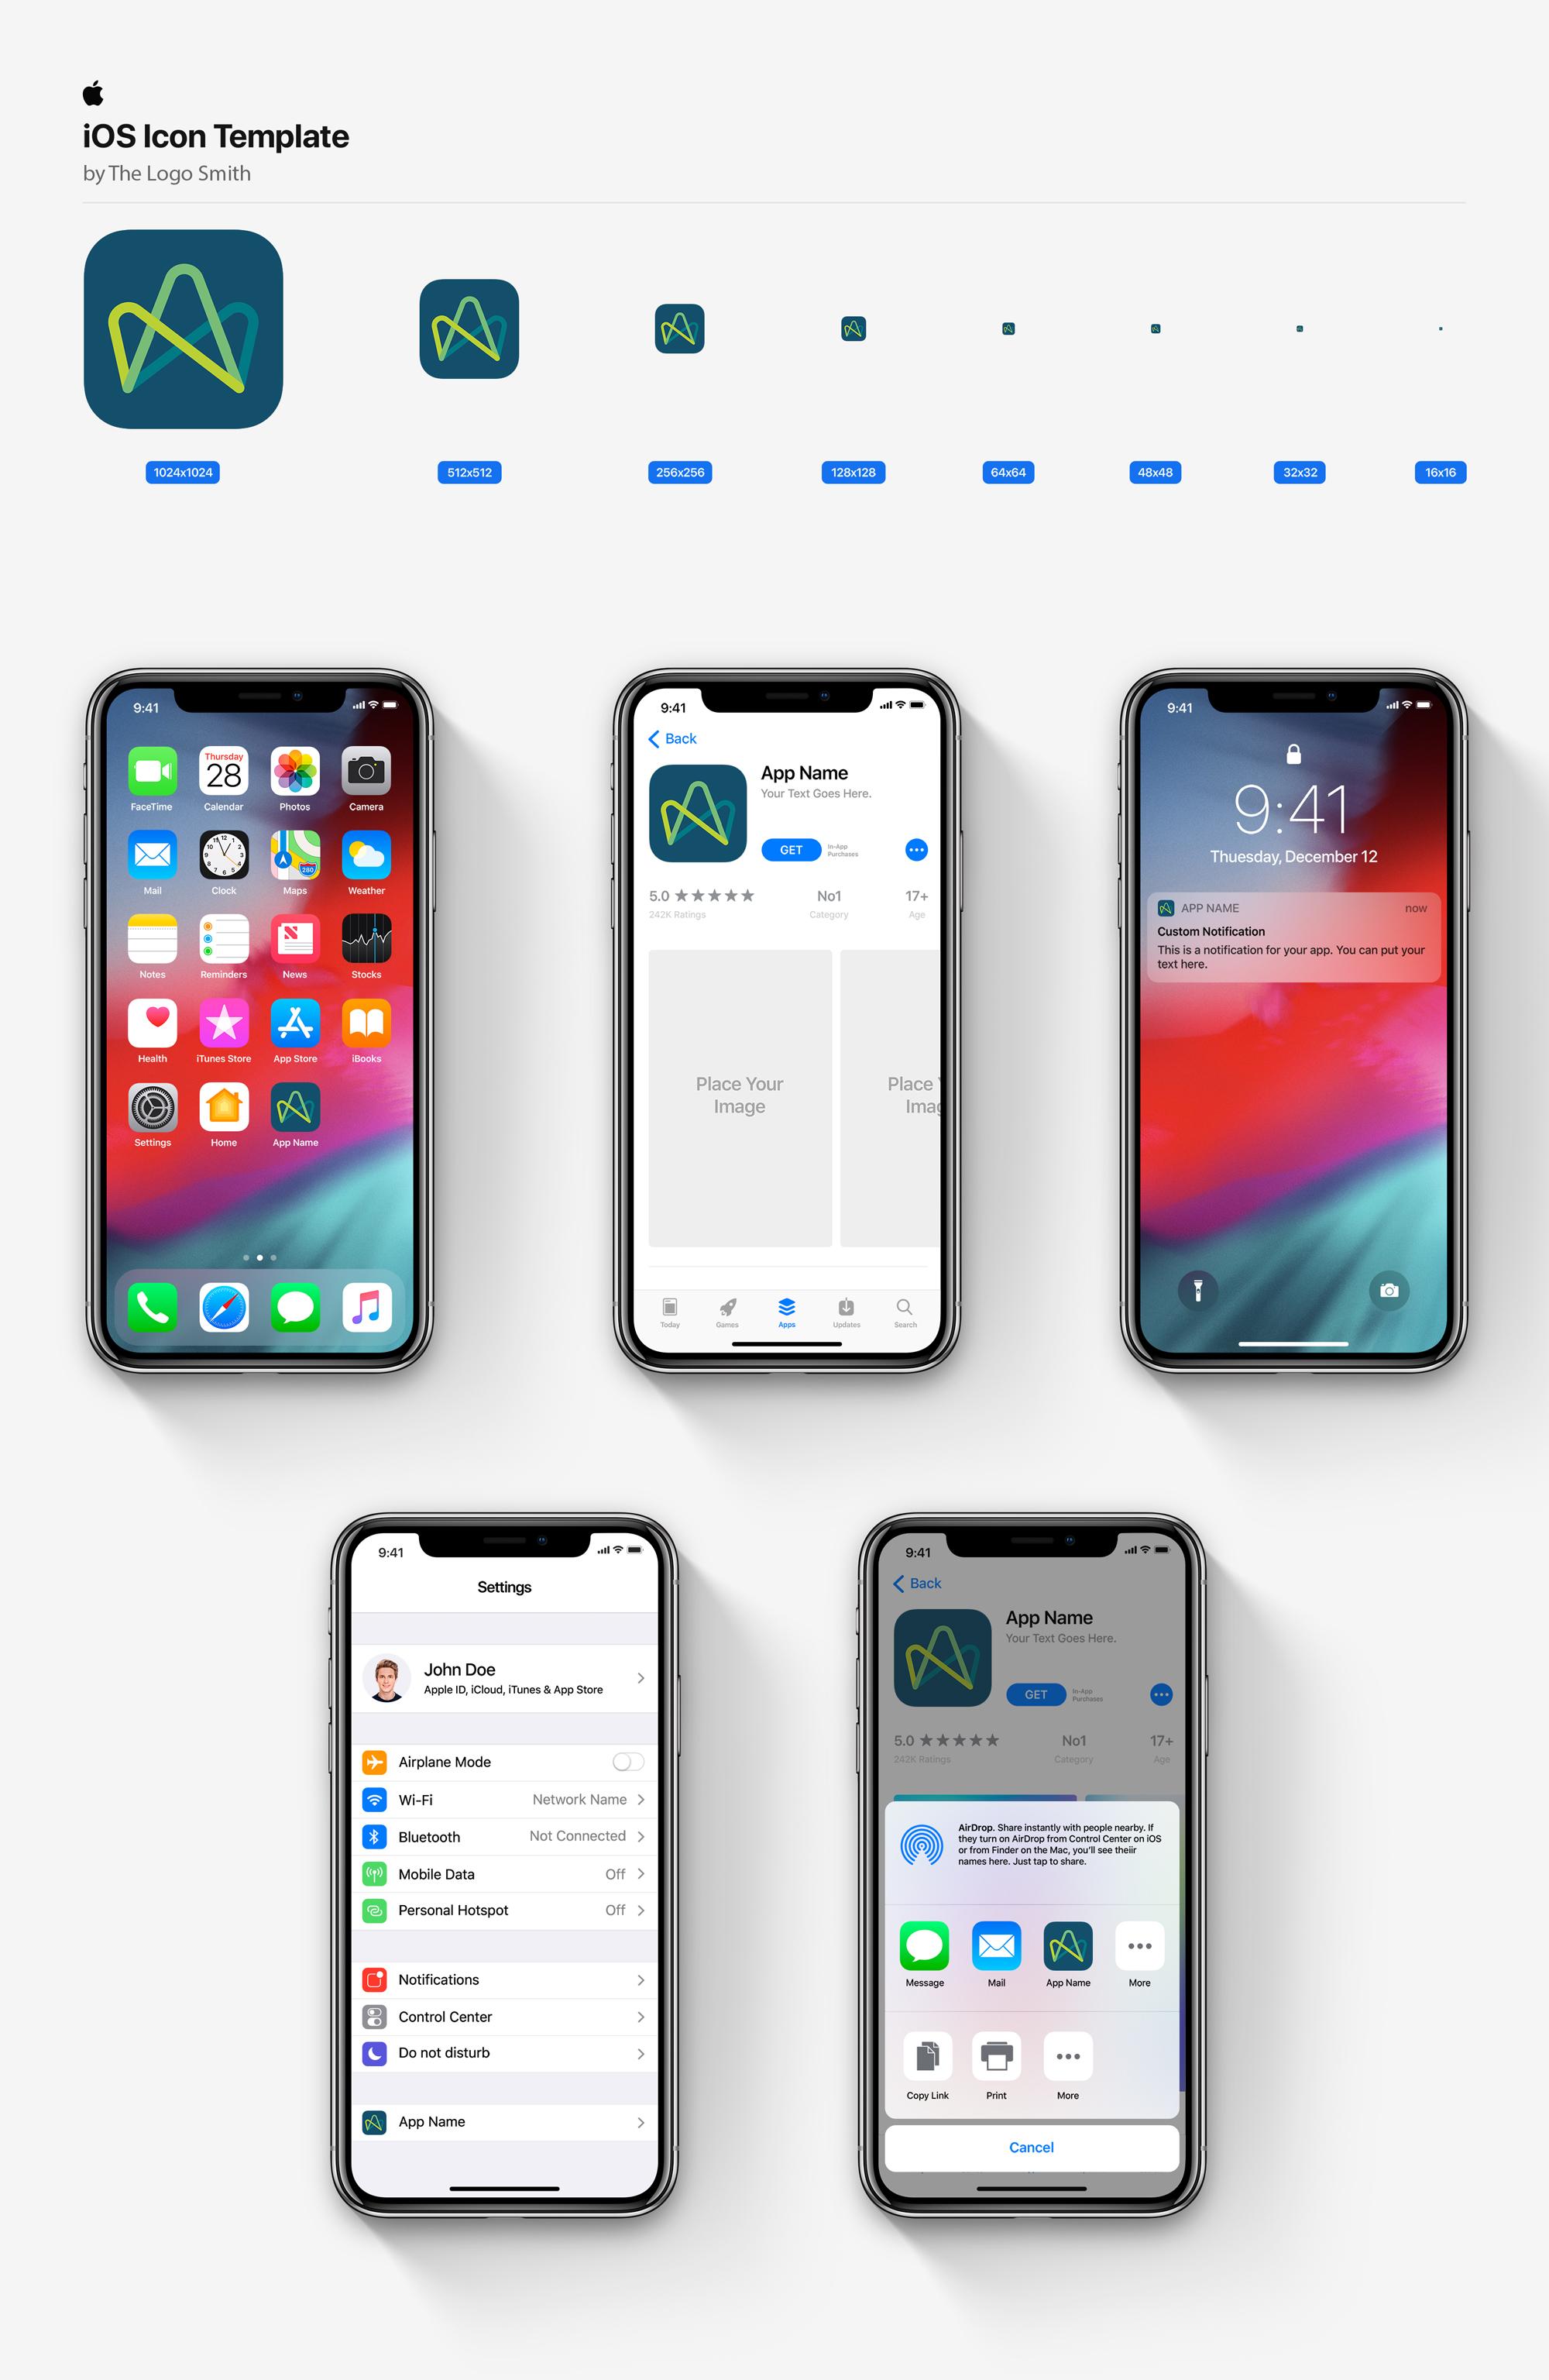 Advatera iOS Icon Template Mockup Designed by The Logo Smith Freelance Logo Designer